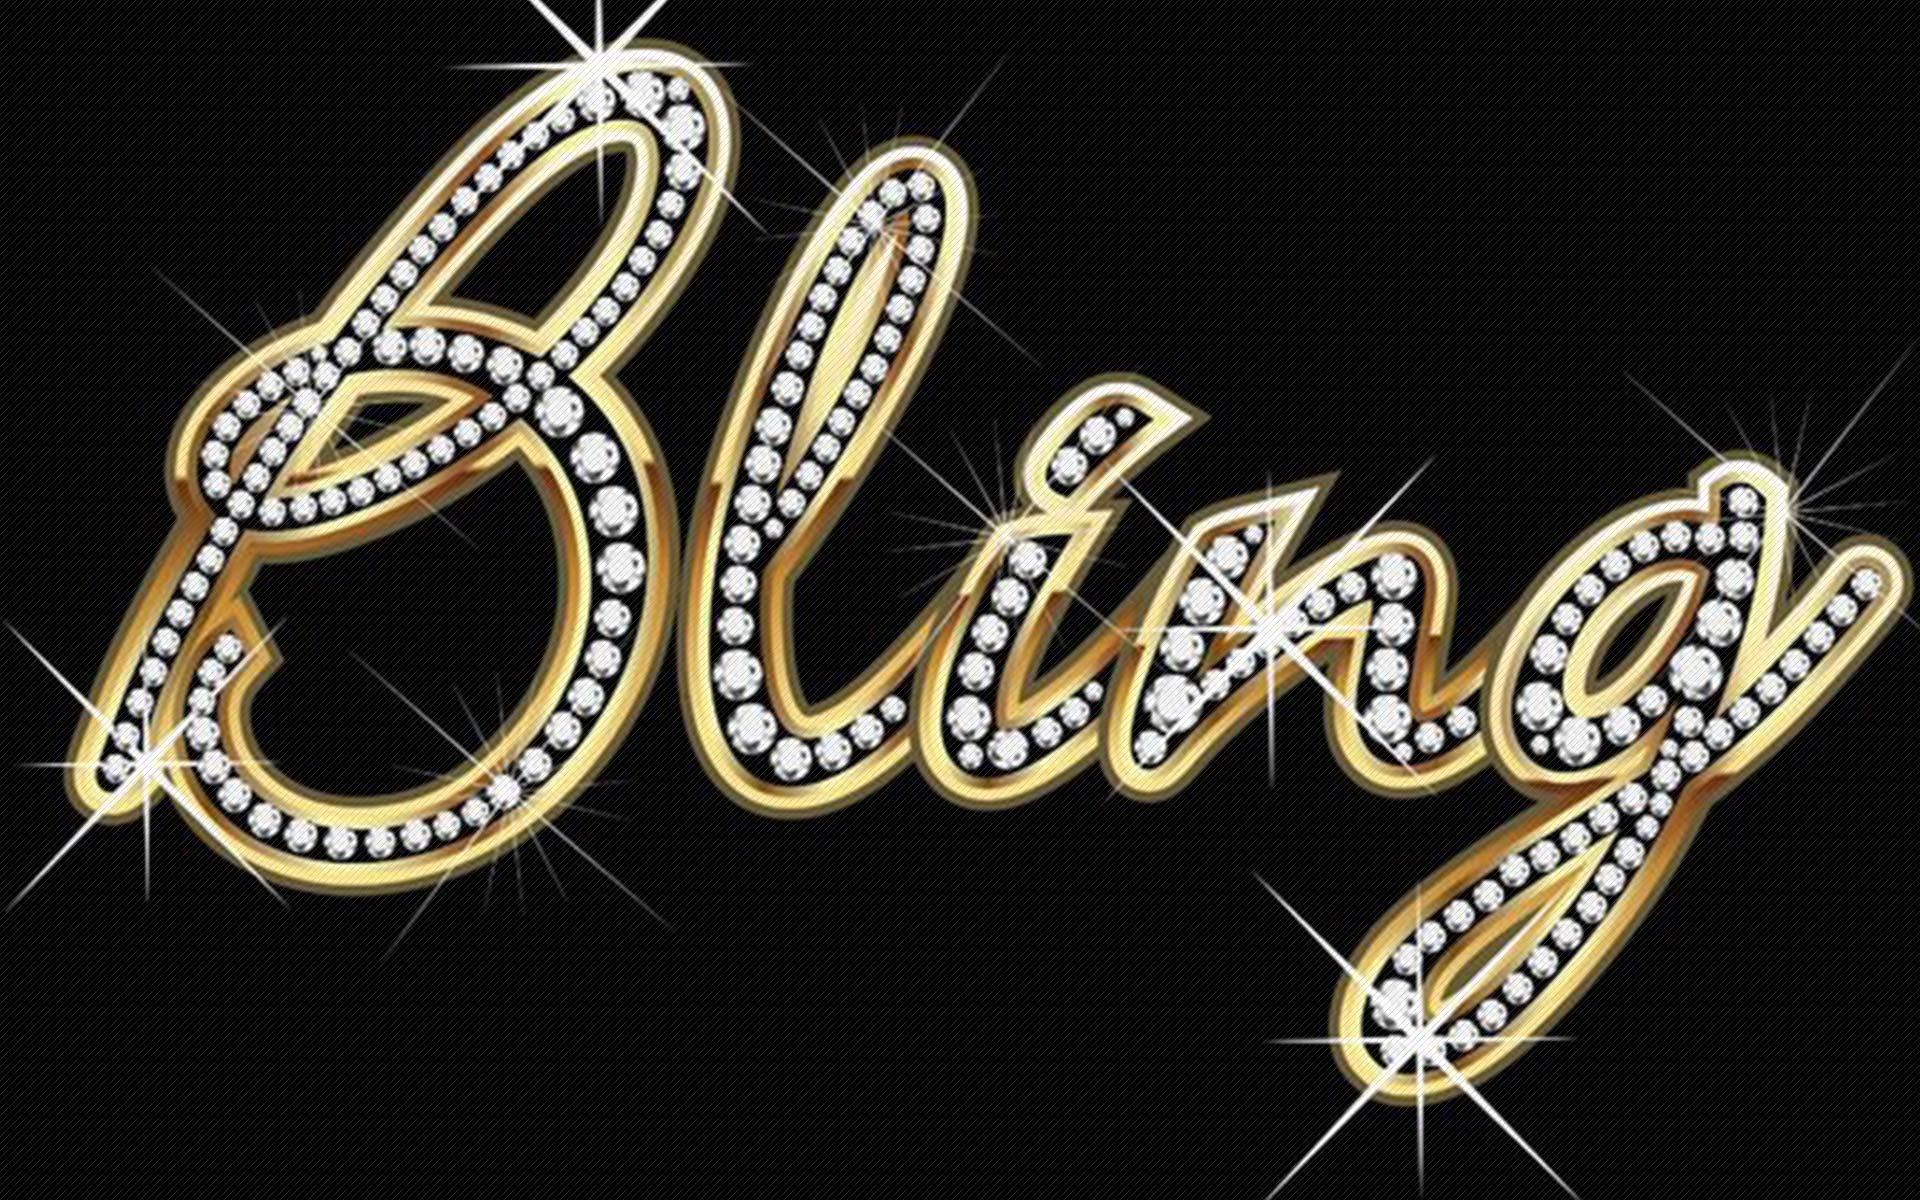 bling | Euro Palace Casino Blog